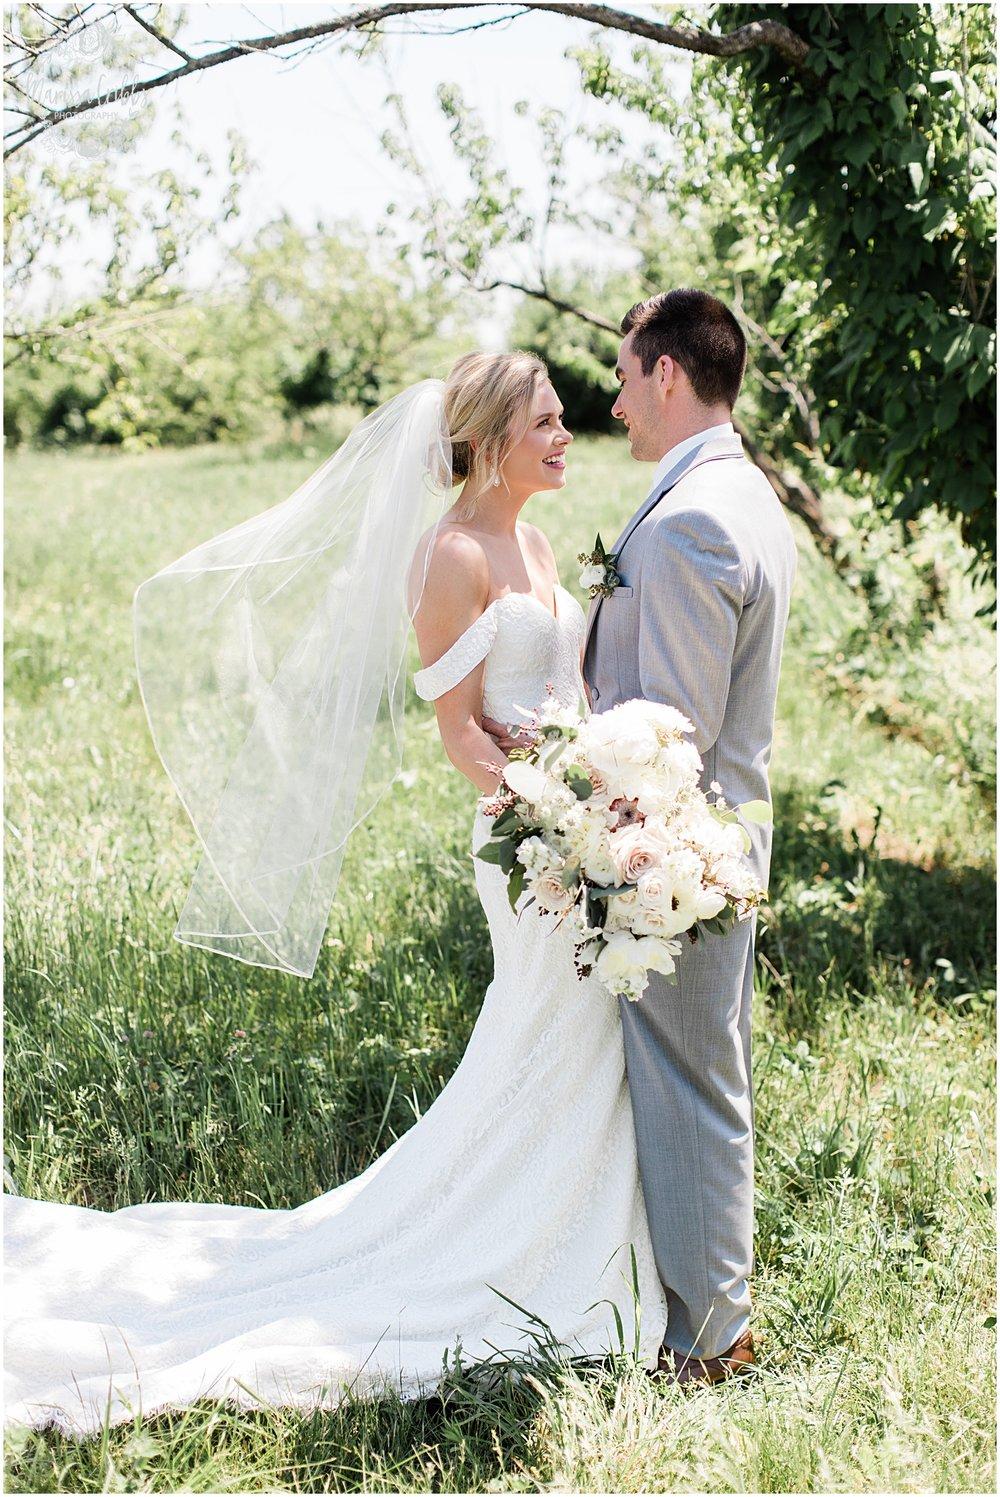 RHODES WEDDING | WESTON RED BARN FARM | MARISSA CRIBBS PHOTOGRAPHY_5228.jpg